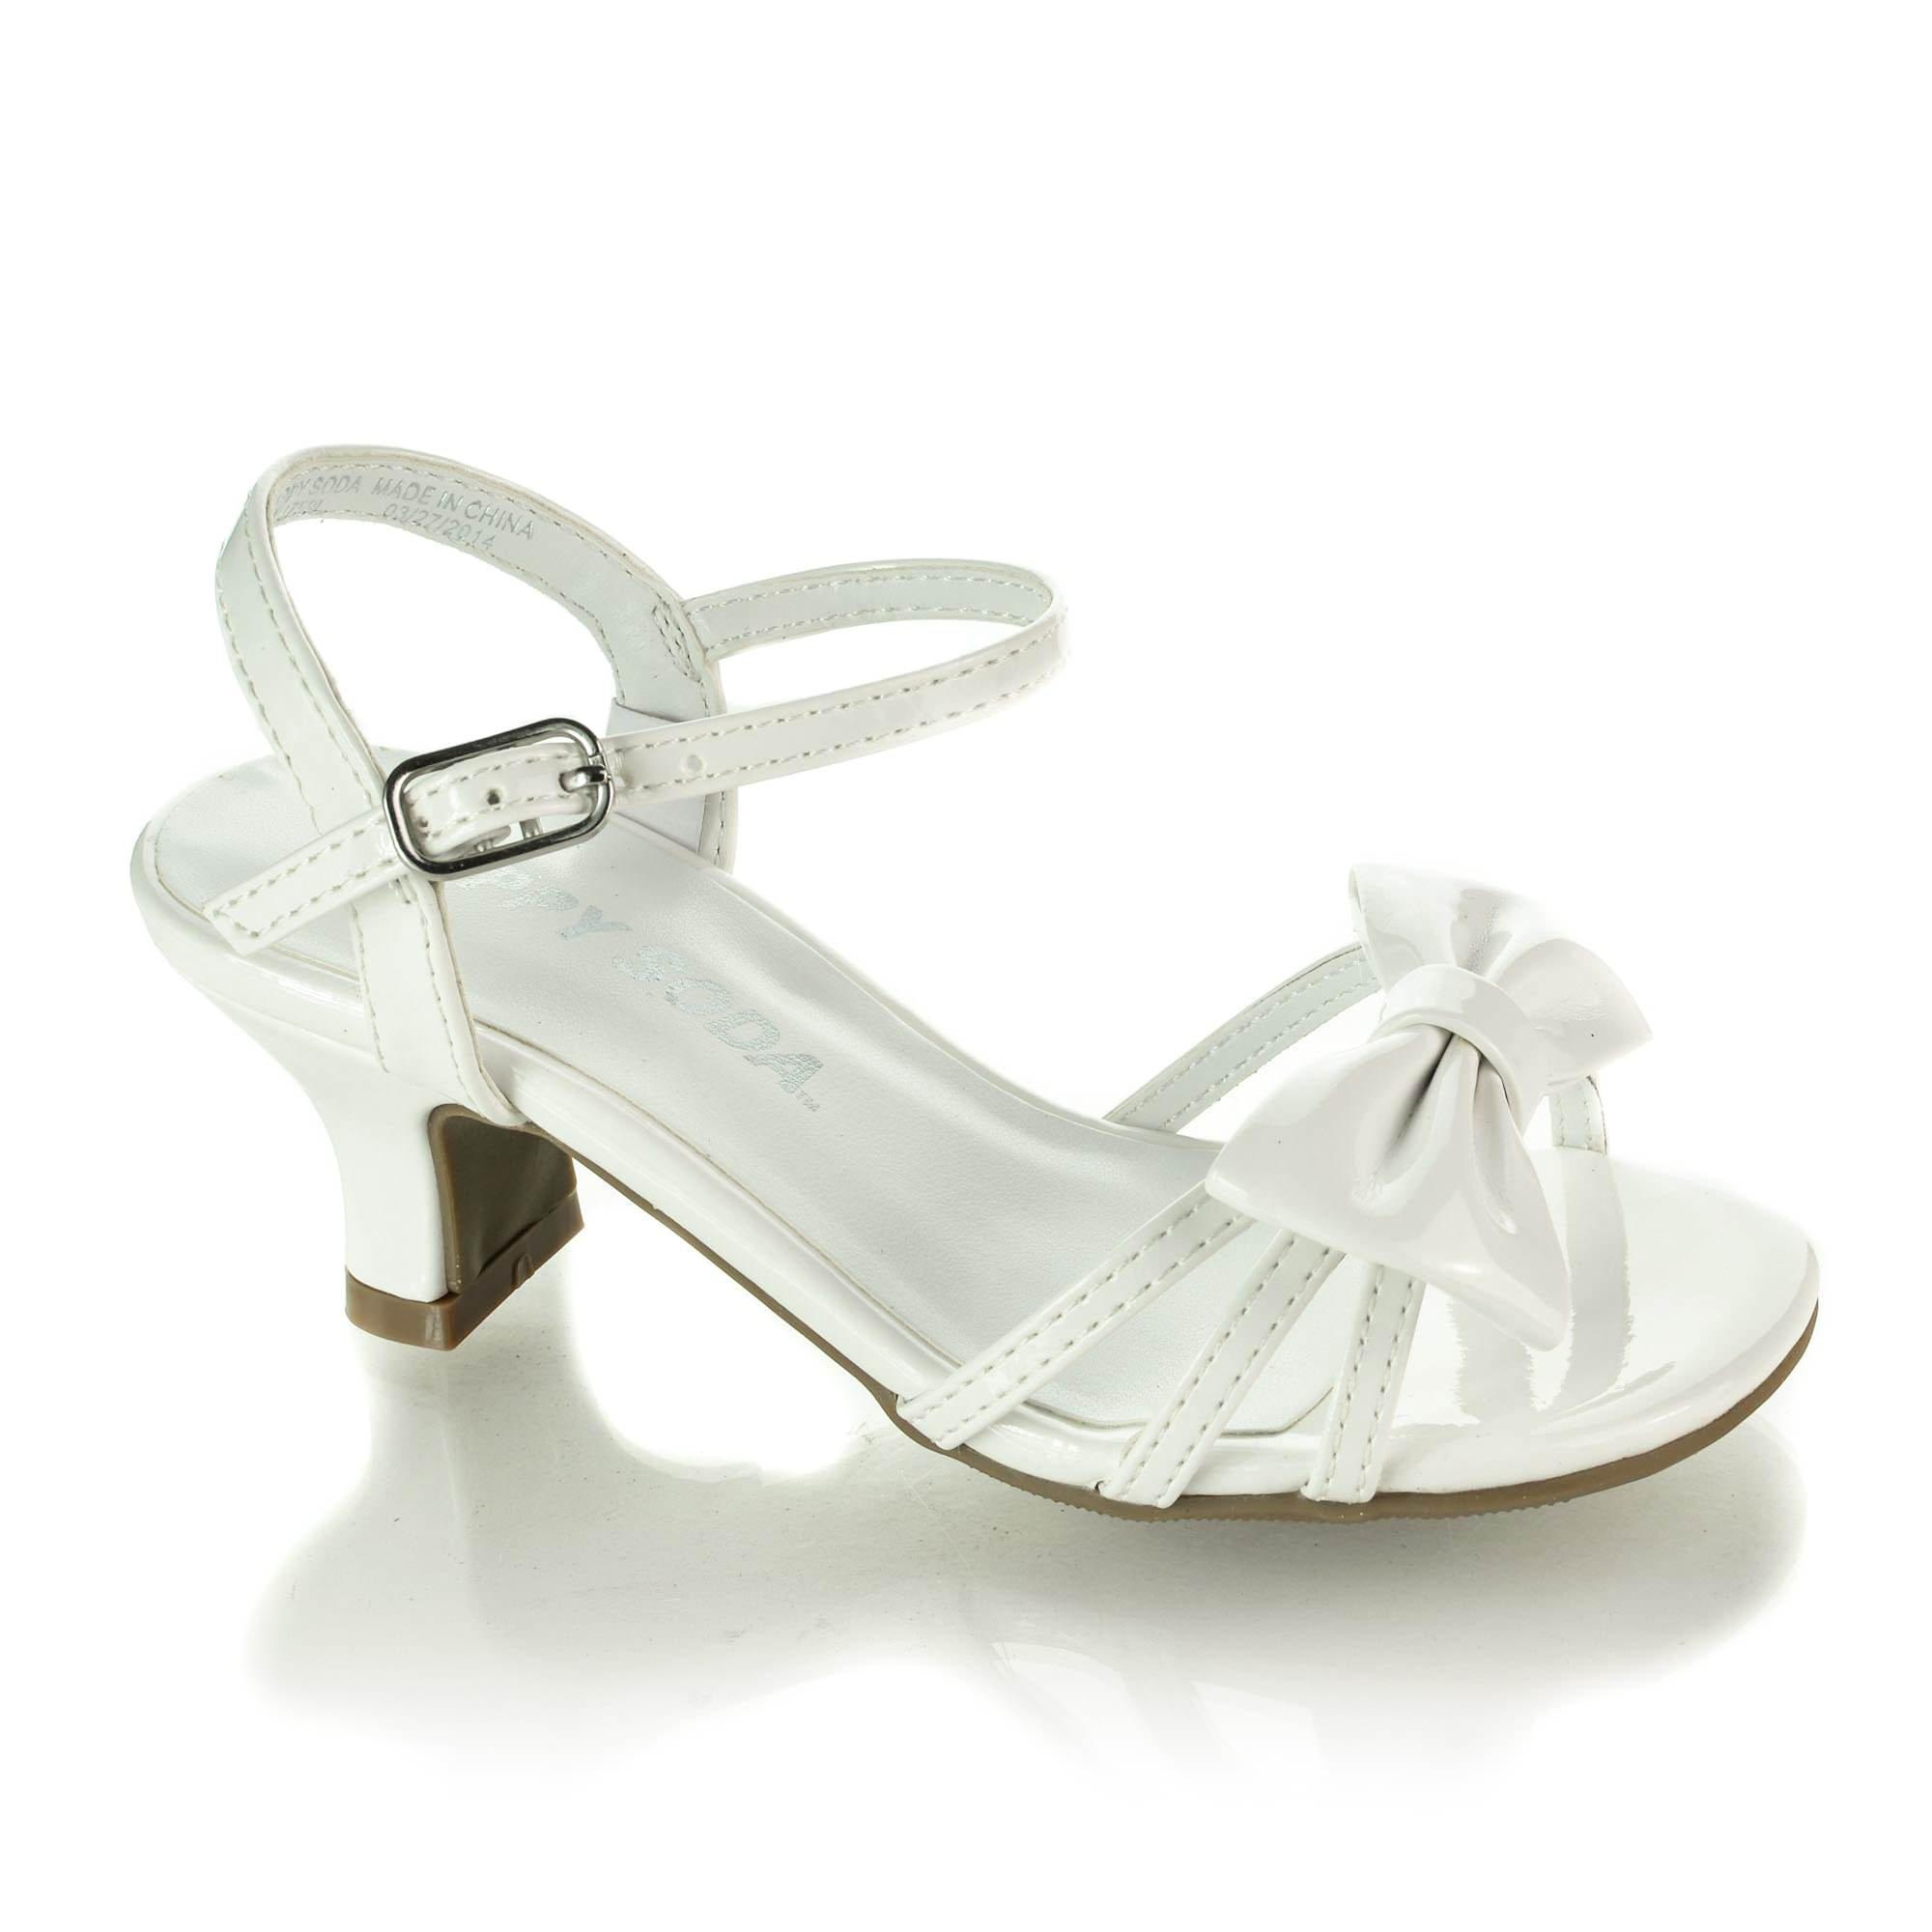 3098df8fdb4d SODA Sarina-2 Children s Girl s Open Toe Slingback Block High Heel Sandals  product image